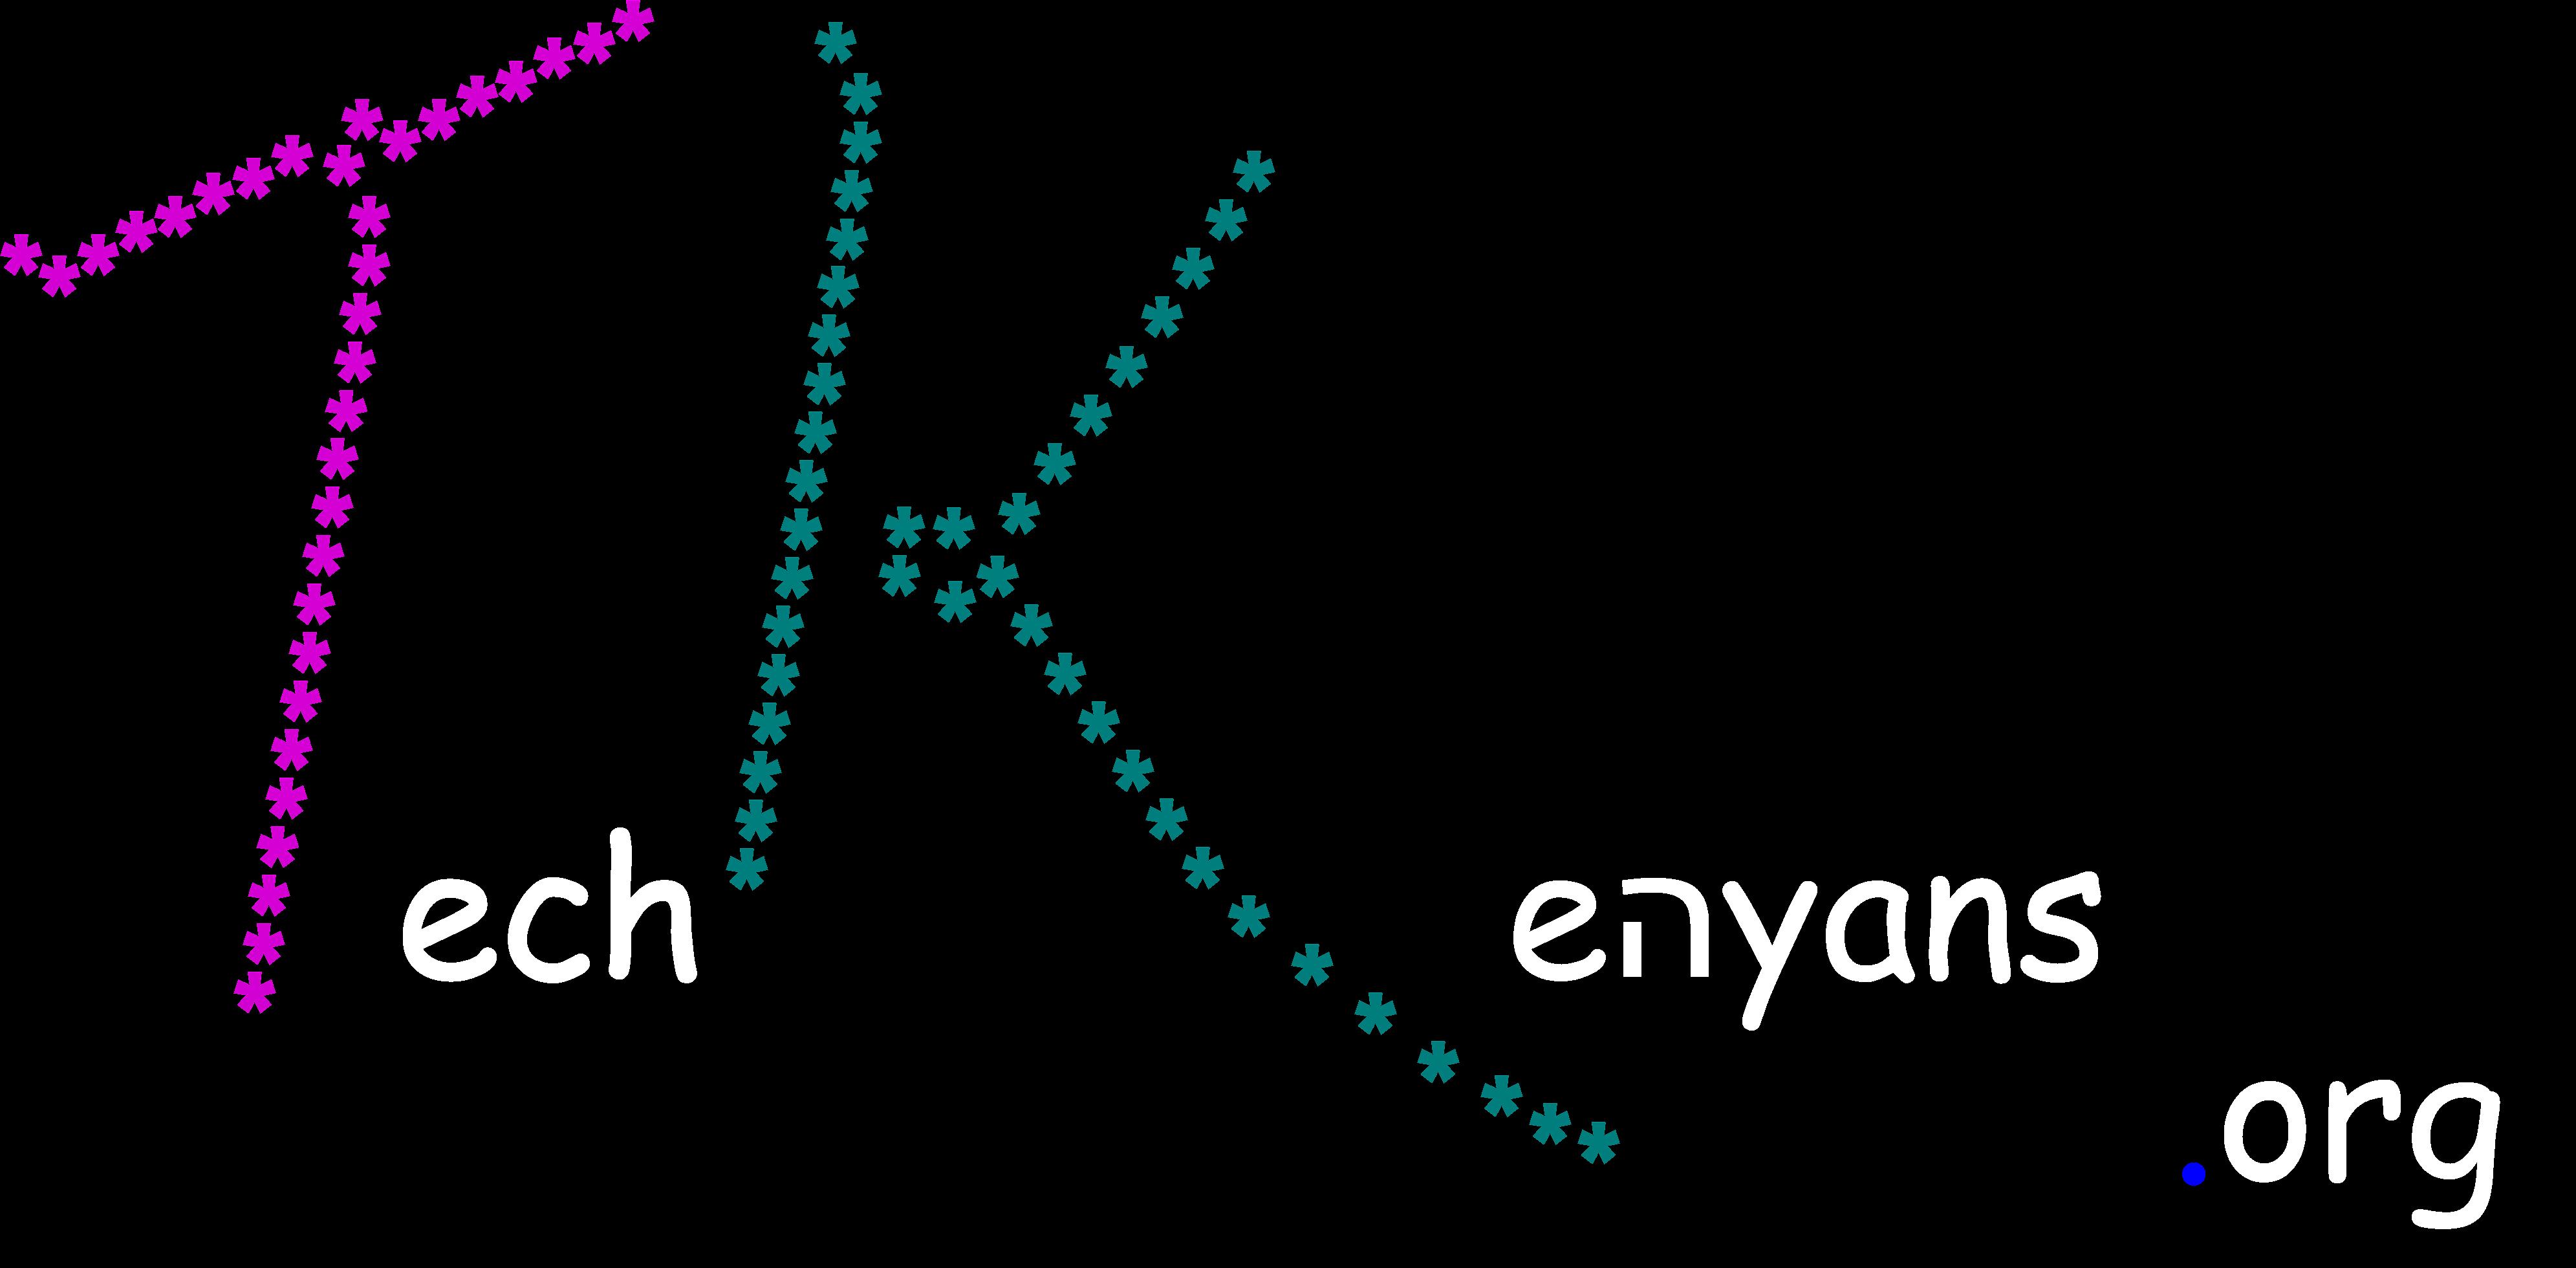 TechKenyans.org